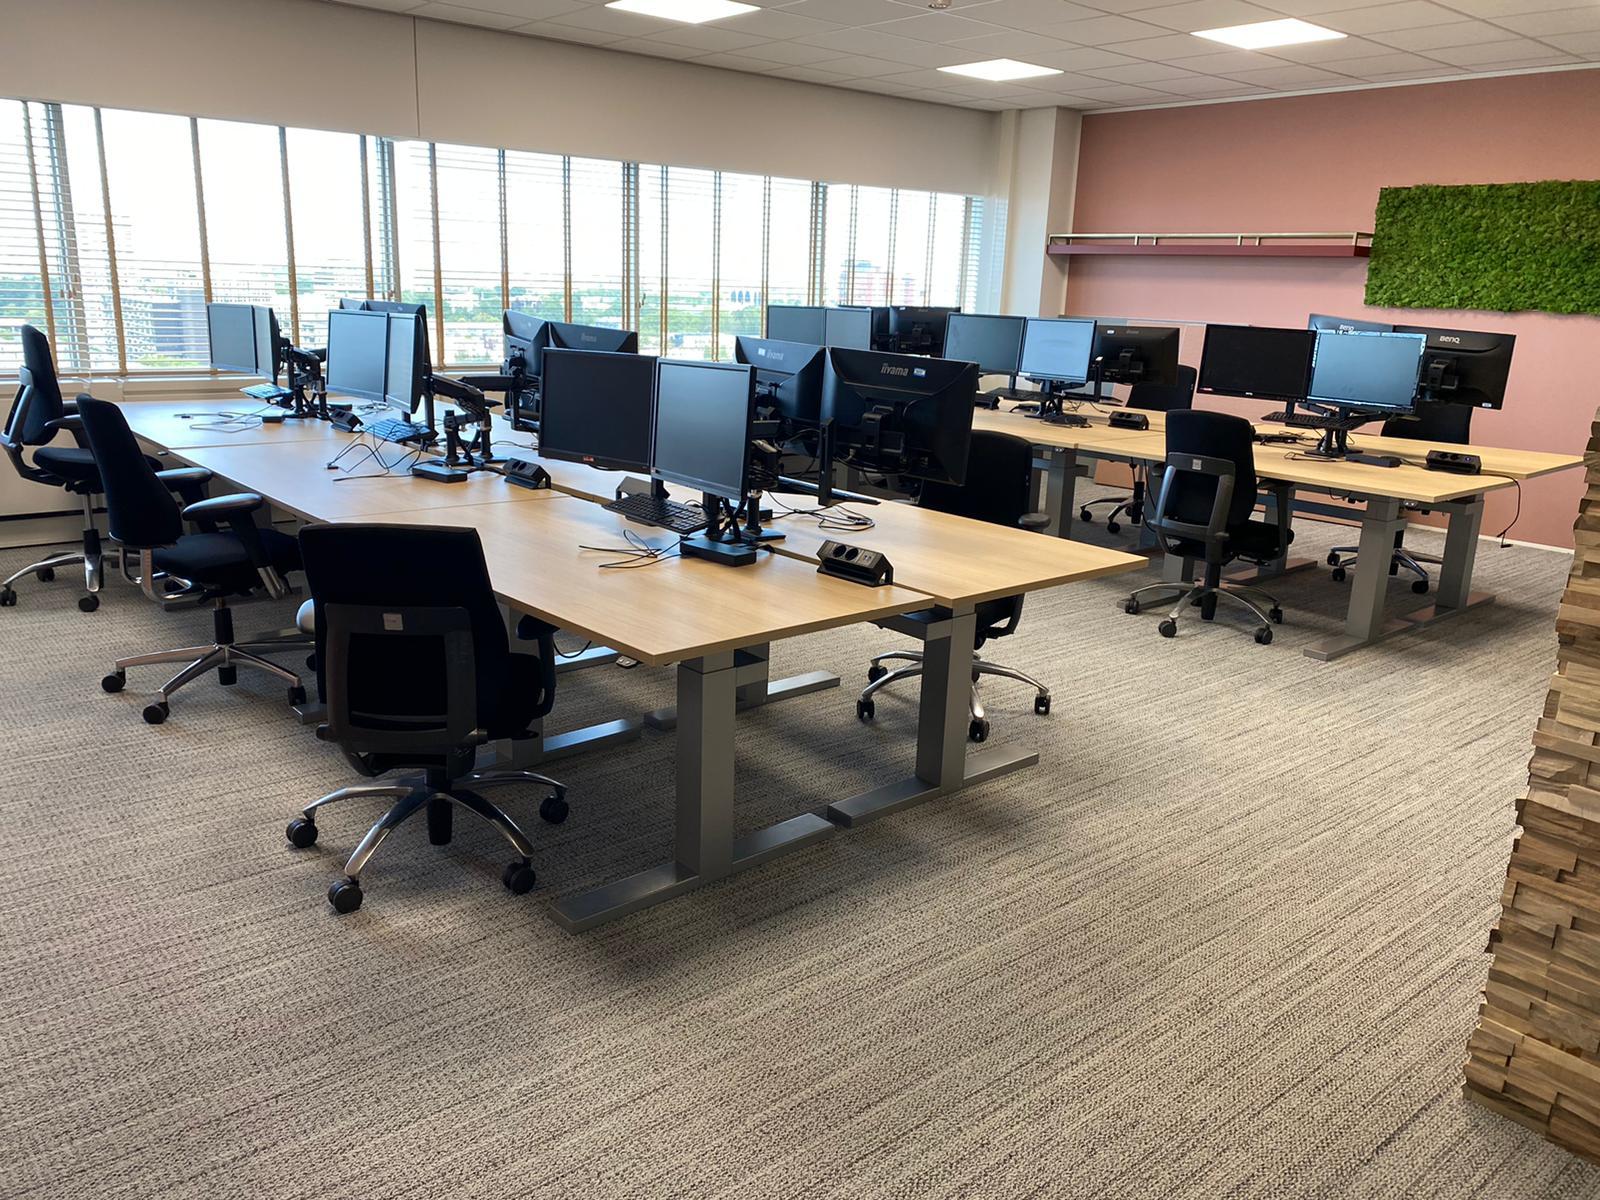 Werkplek bekabeling - kabelmanagement - ergonomisch - snoeren wegwerken - monitorarmen - kantoorinrichting